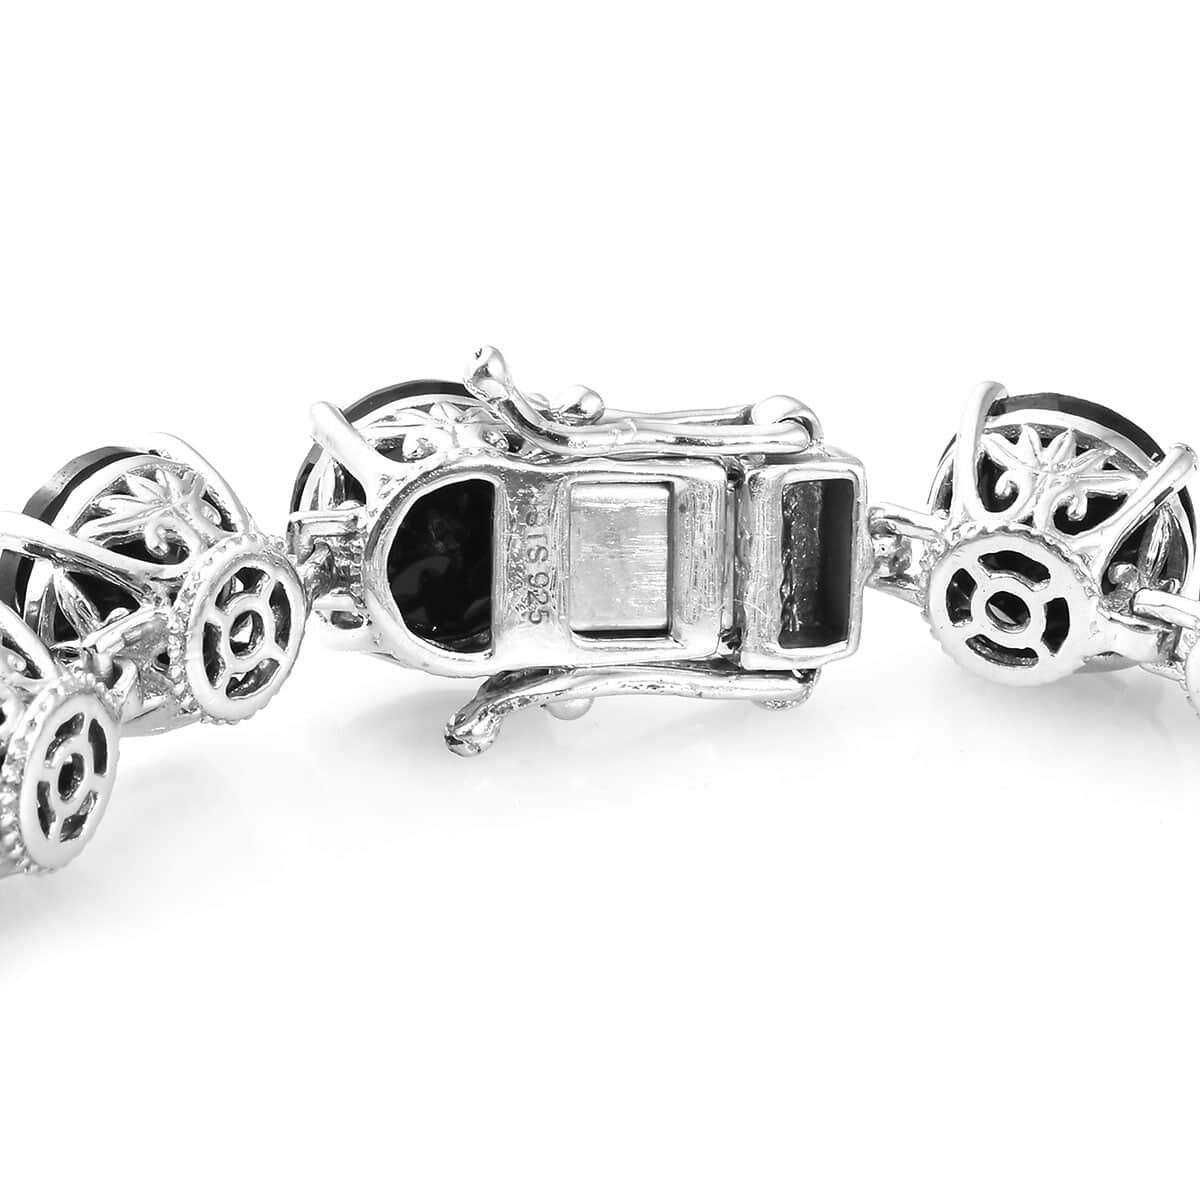 Thai Black Spinel Bracelet in Platinum Over Sterling Silver (7.25 In) (18.03 g) 65.75 ctw